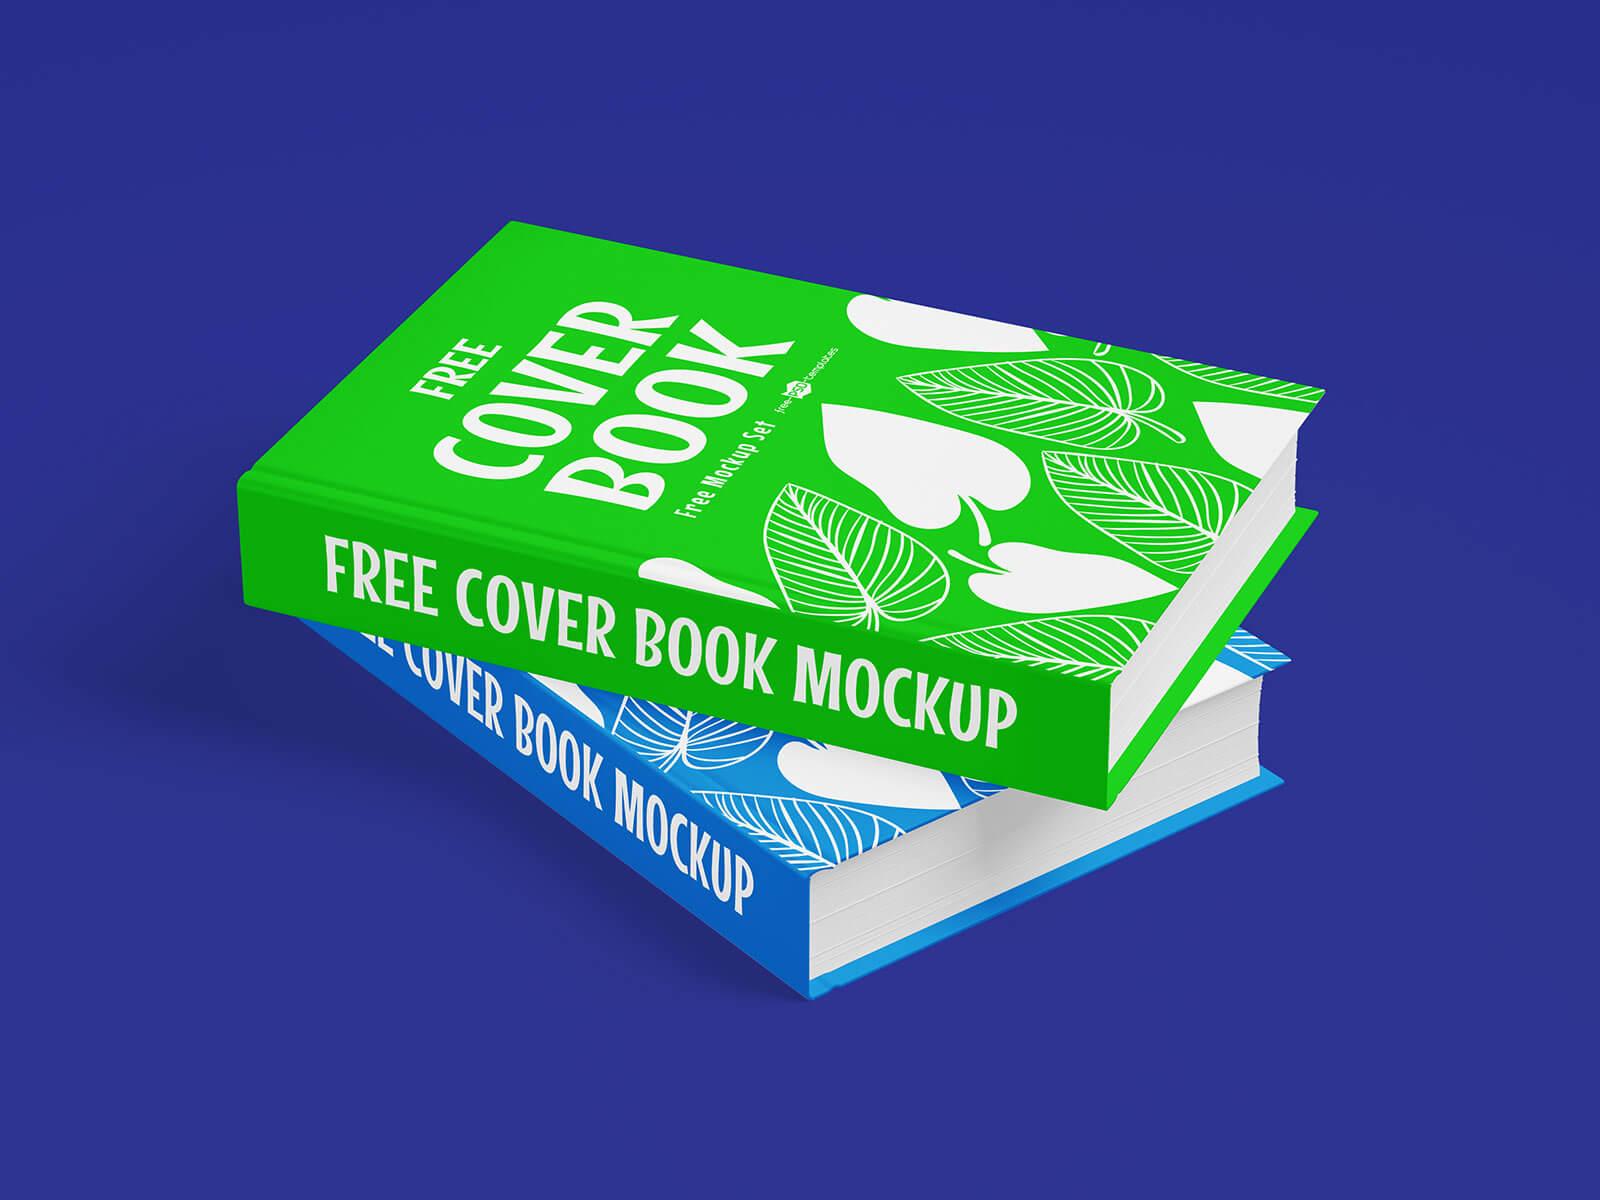 Free Hardcover Book Title Mockup PSD Set (2)